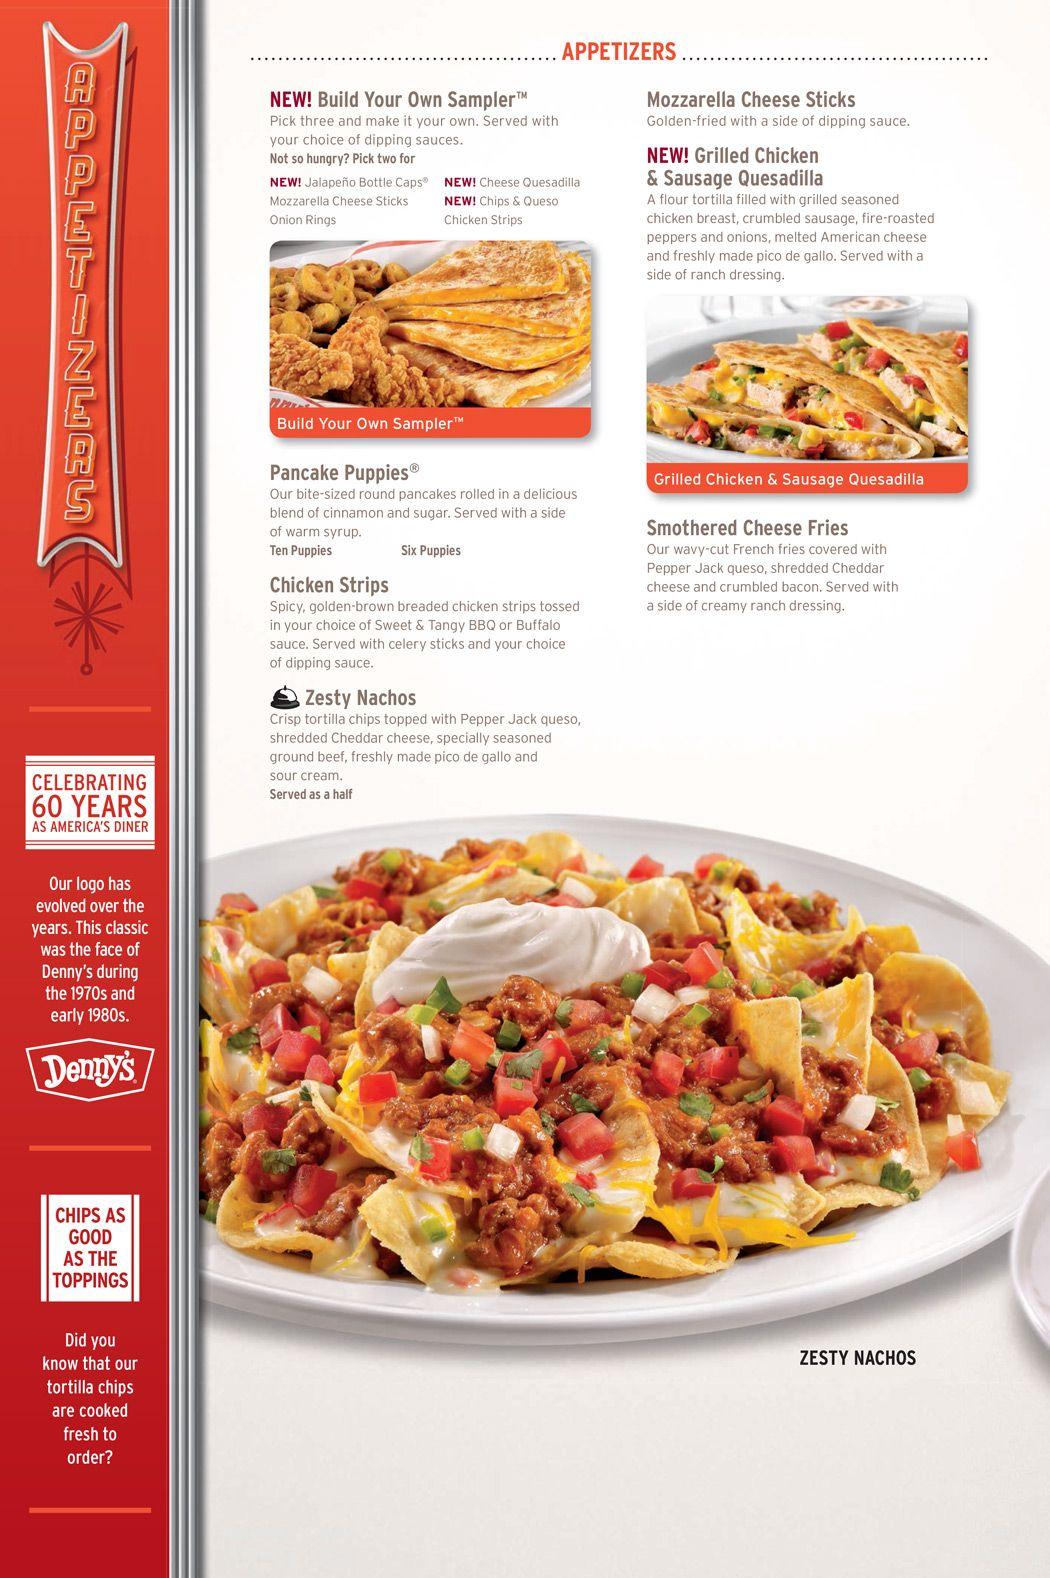 Dennys-menu-6   Denny\'s   Pinterest   Menu, Foods and Food and drink